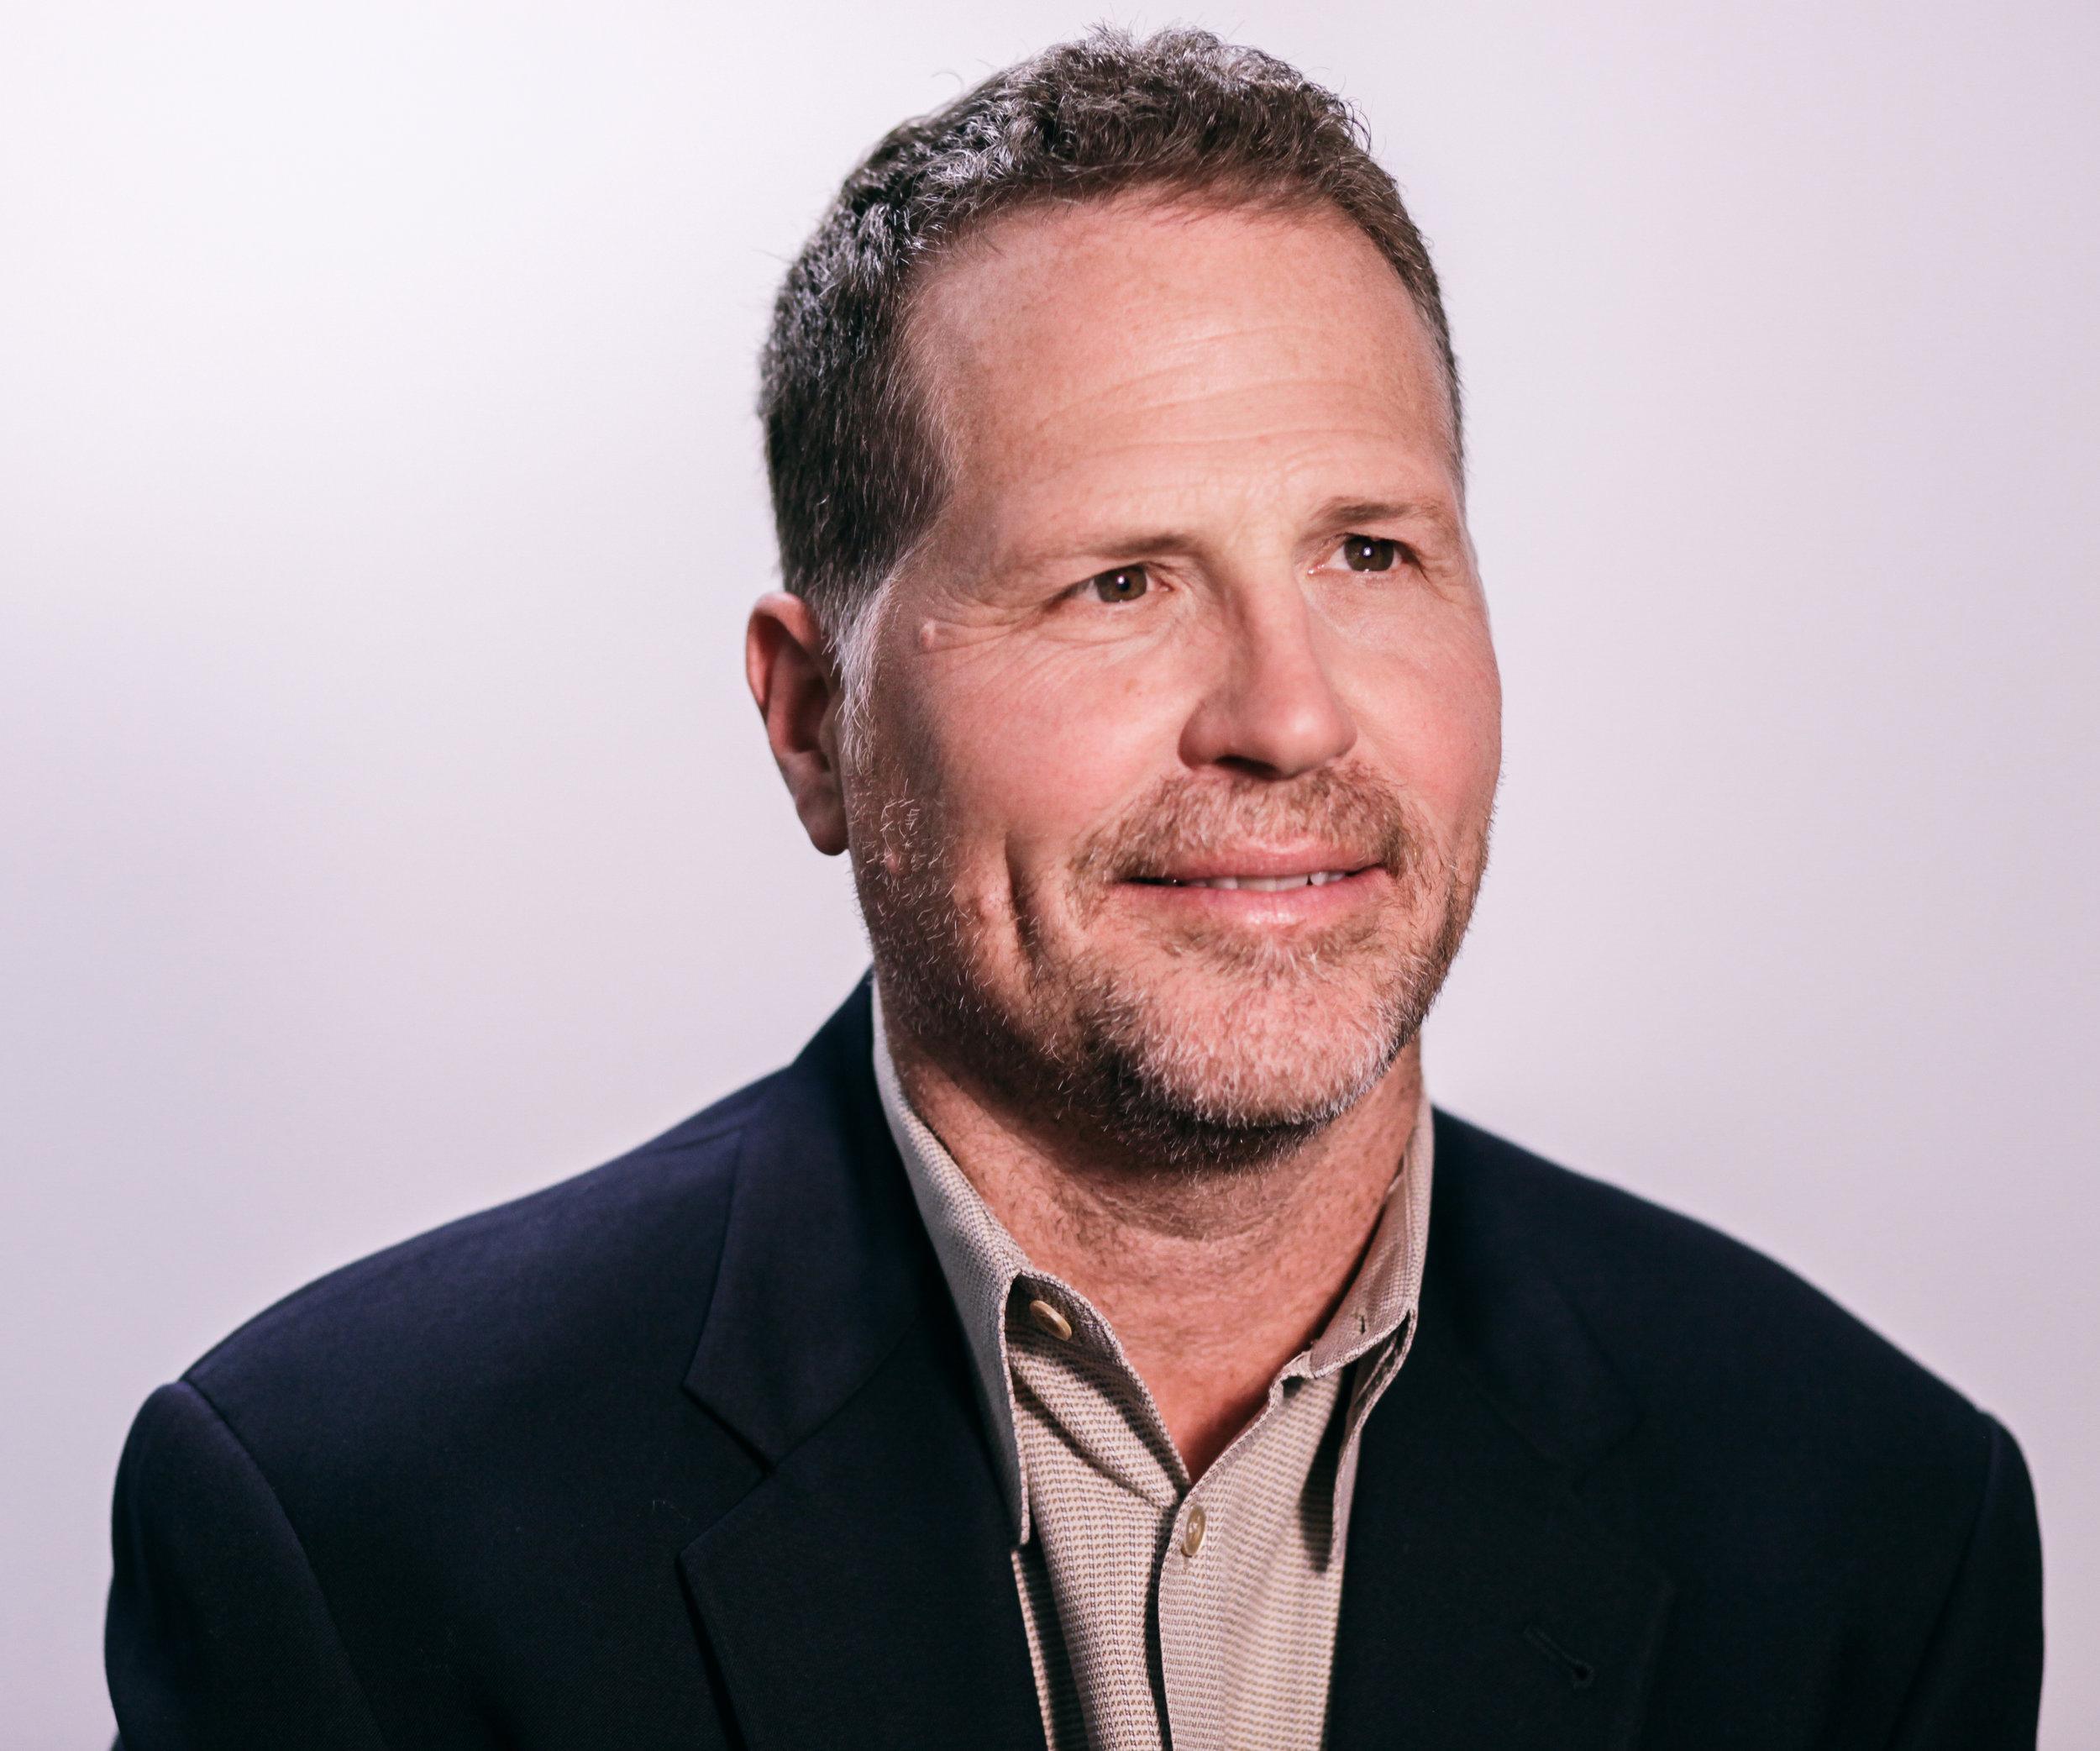 JAY FULCHER, CEO OF ZENEFITS